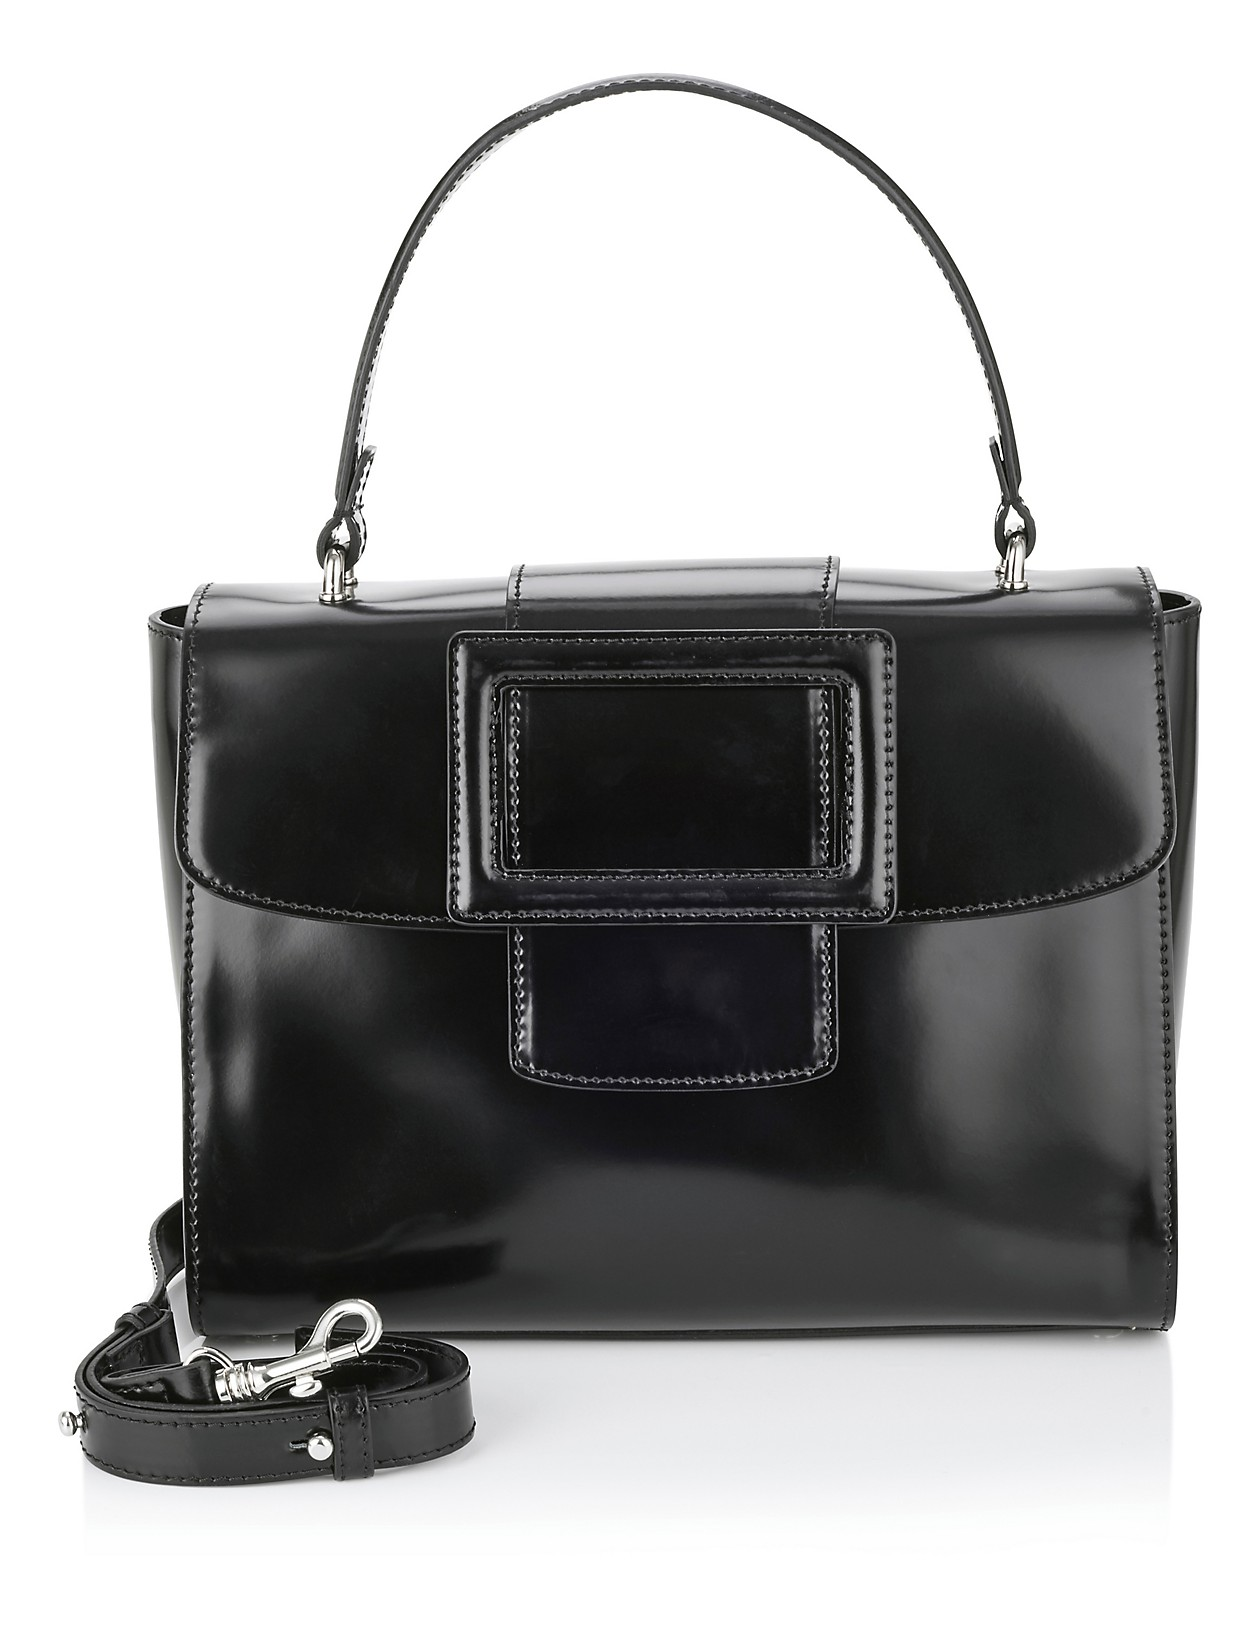 5e05ddac37625 Lack Handtasche